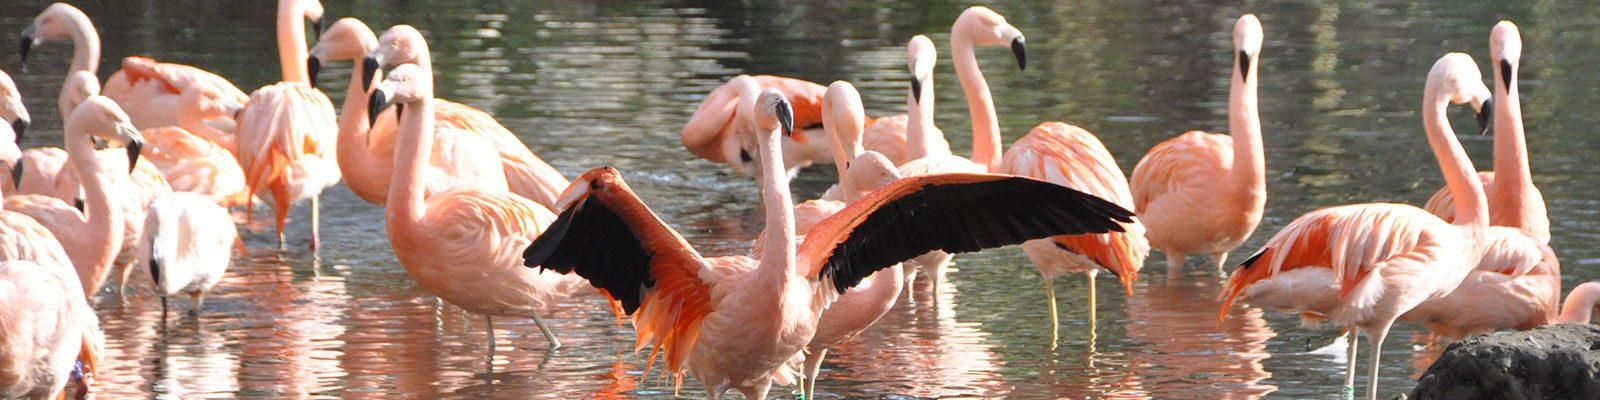 ANIMONDIAL - Bringing compassion to tourism